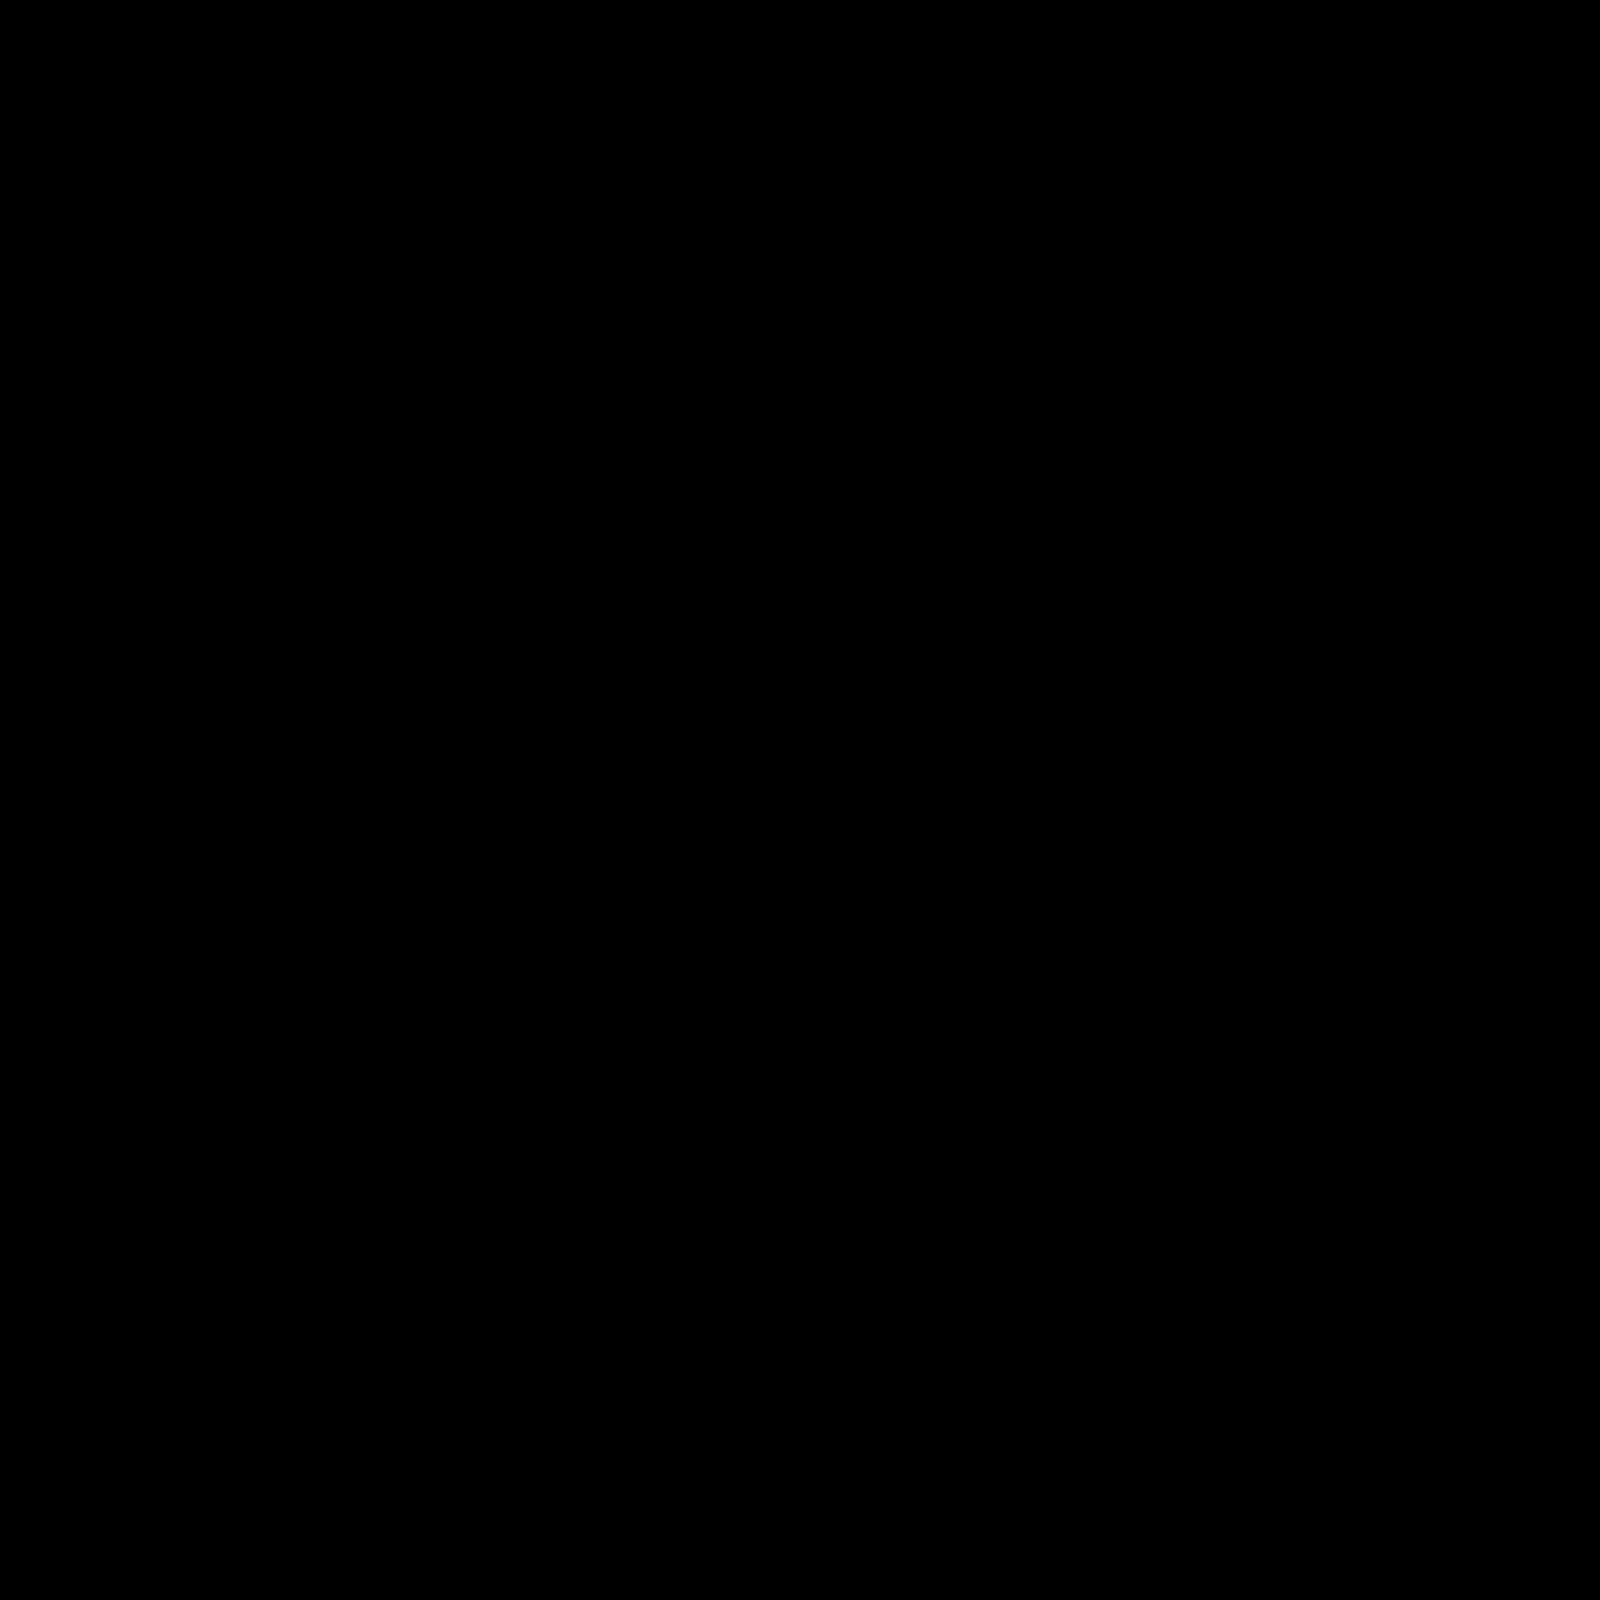 Pantomime icon